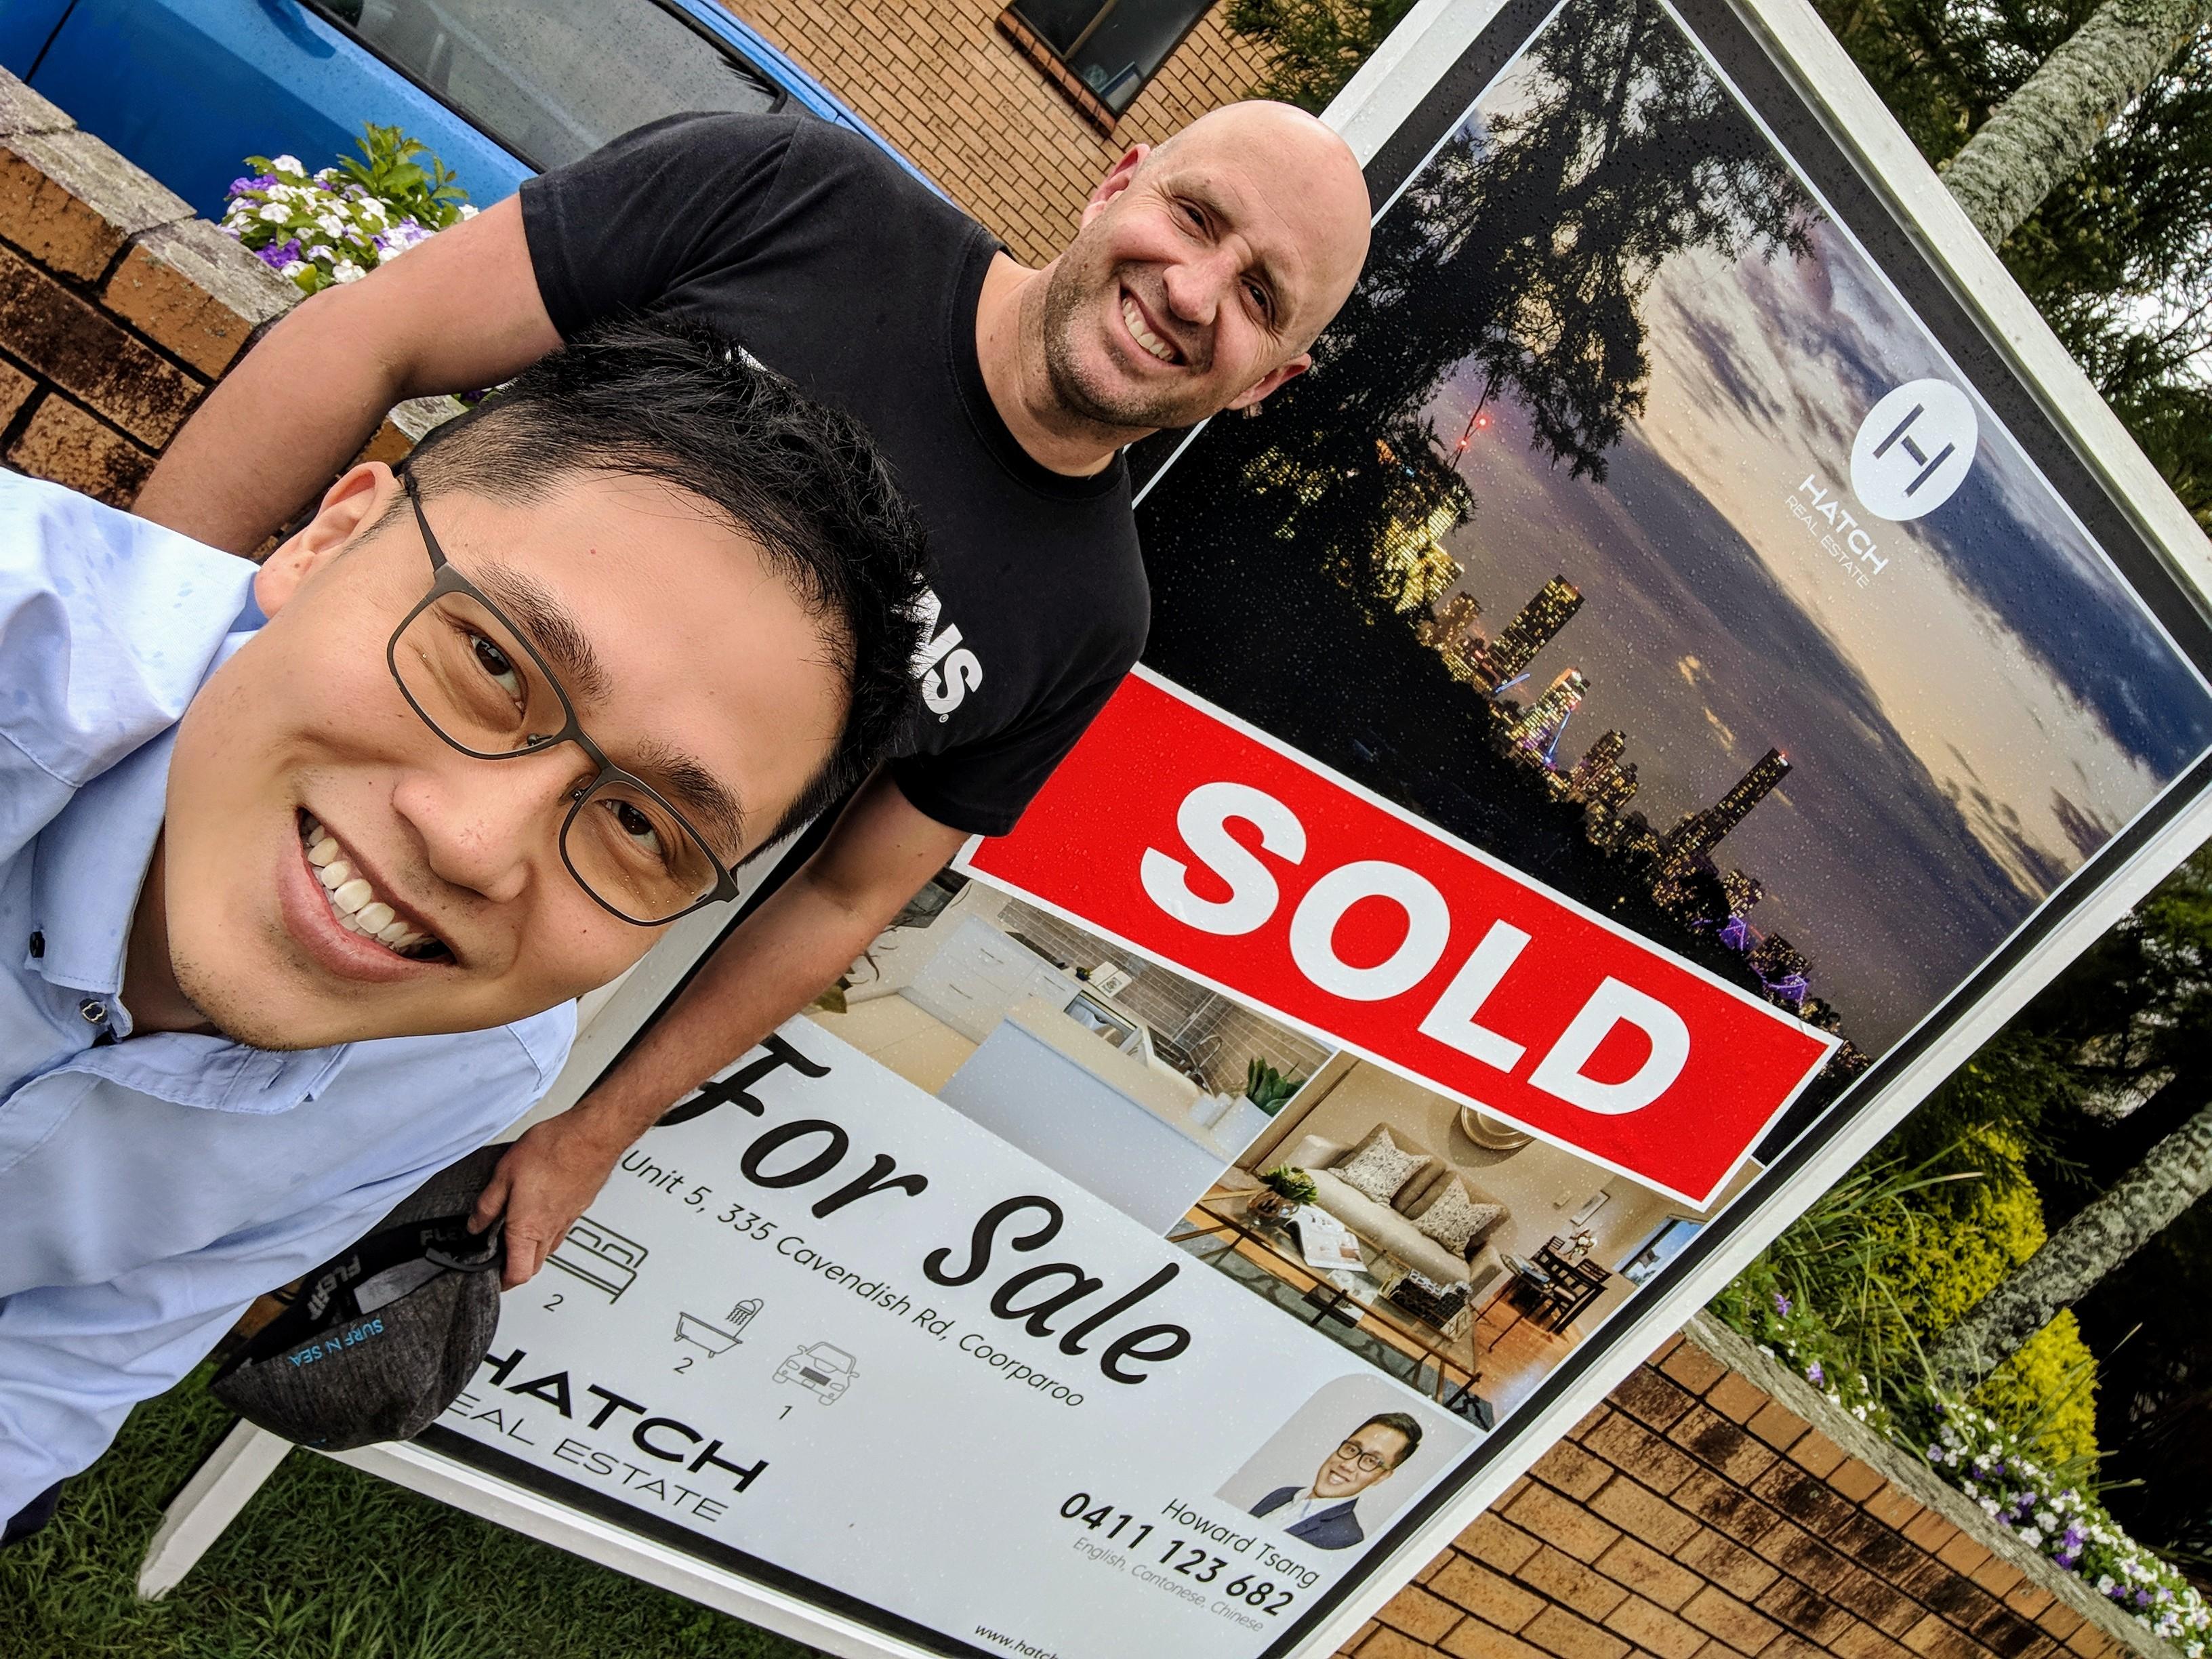 Half a dozen trends in Australian real estate which may continue into 2022